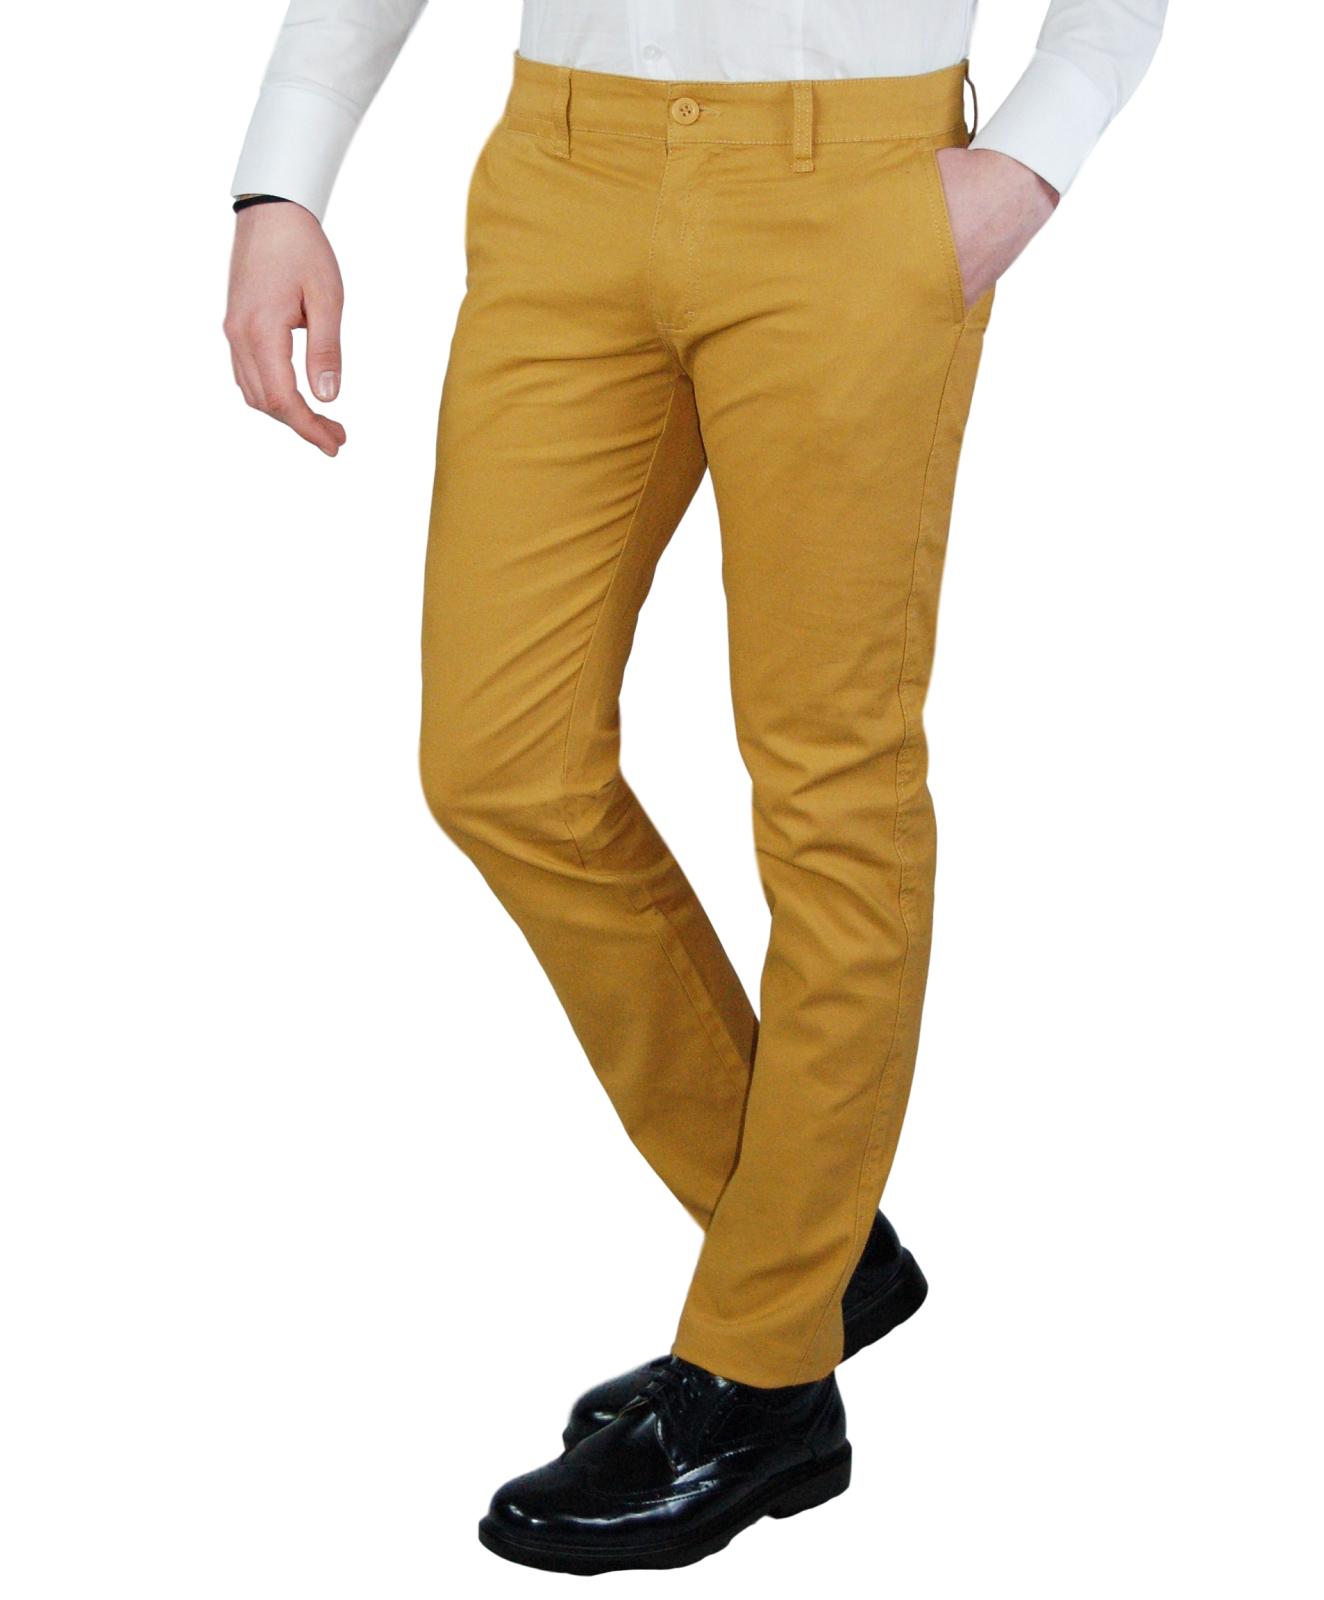 Pantalone-Uomo-Chino-Slim-fit-Primaverile-tasca-america-Bianco-Grigio-Senape-Bei miniatura 24